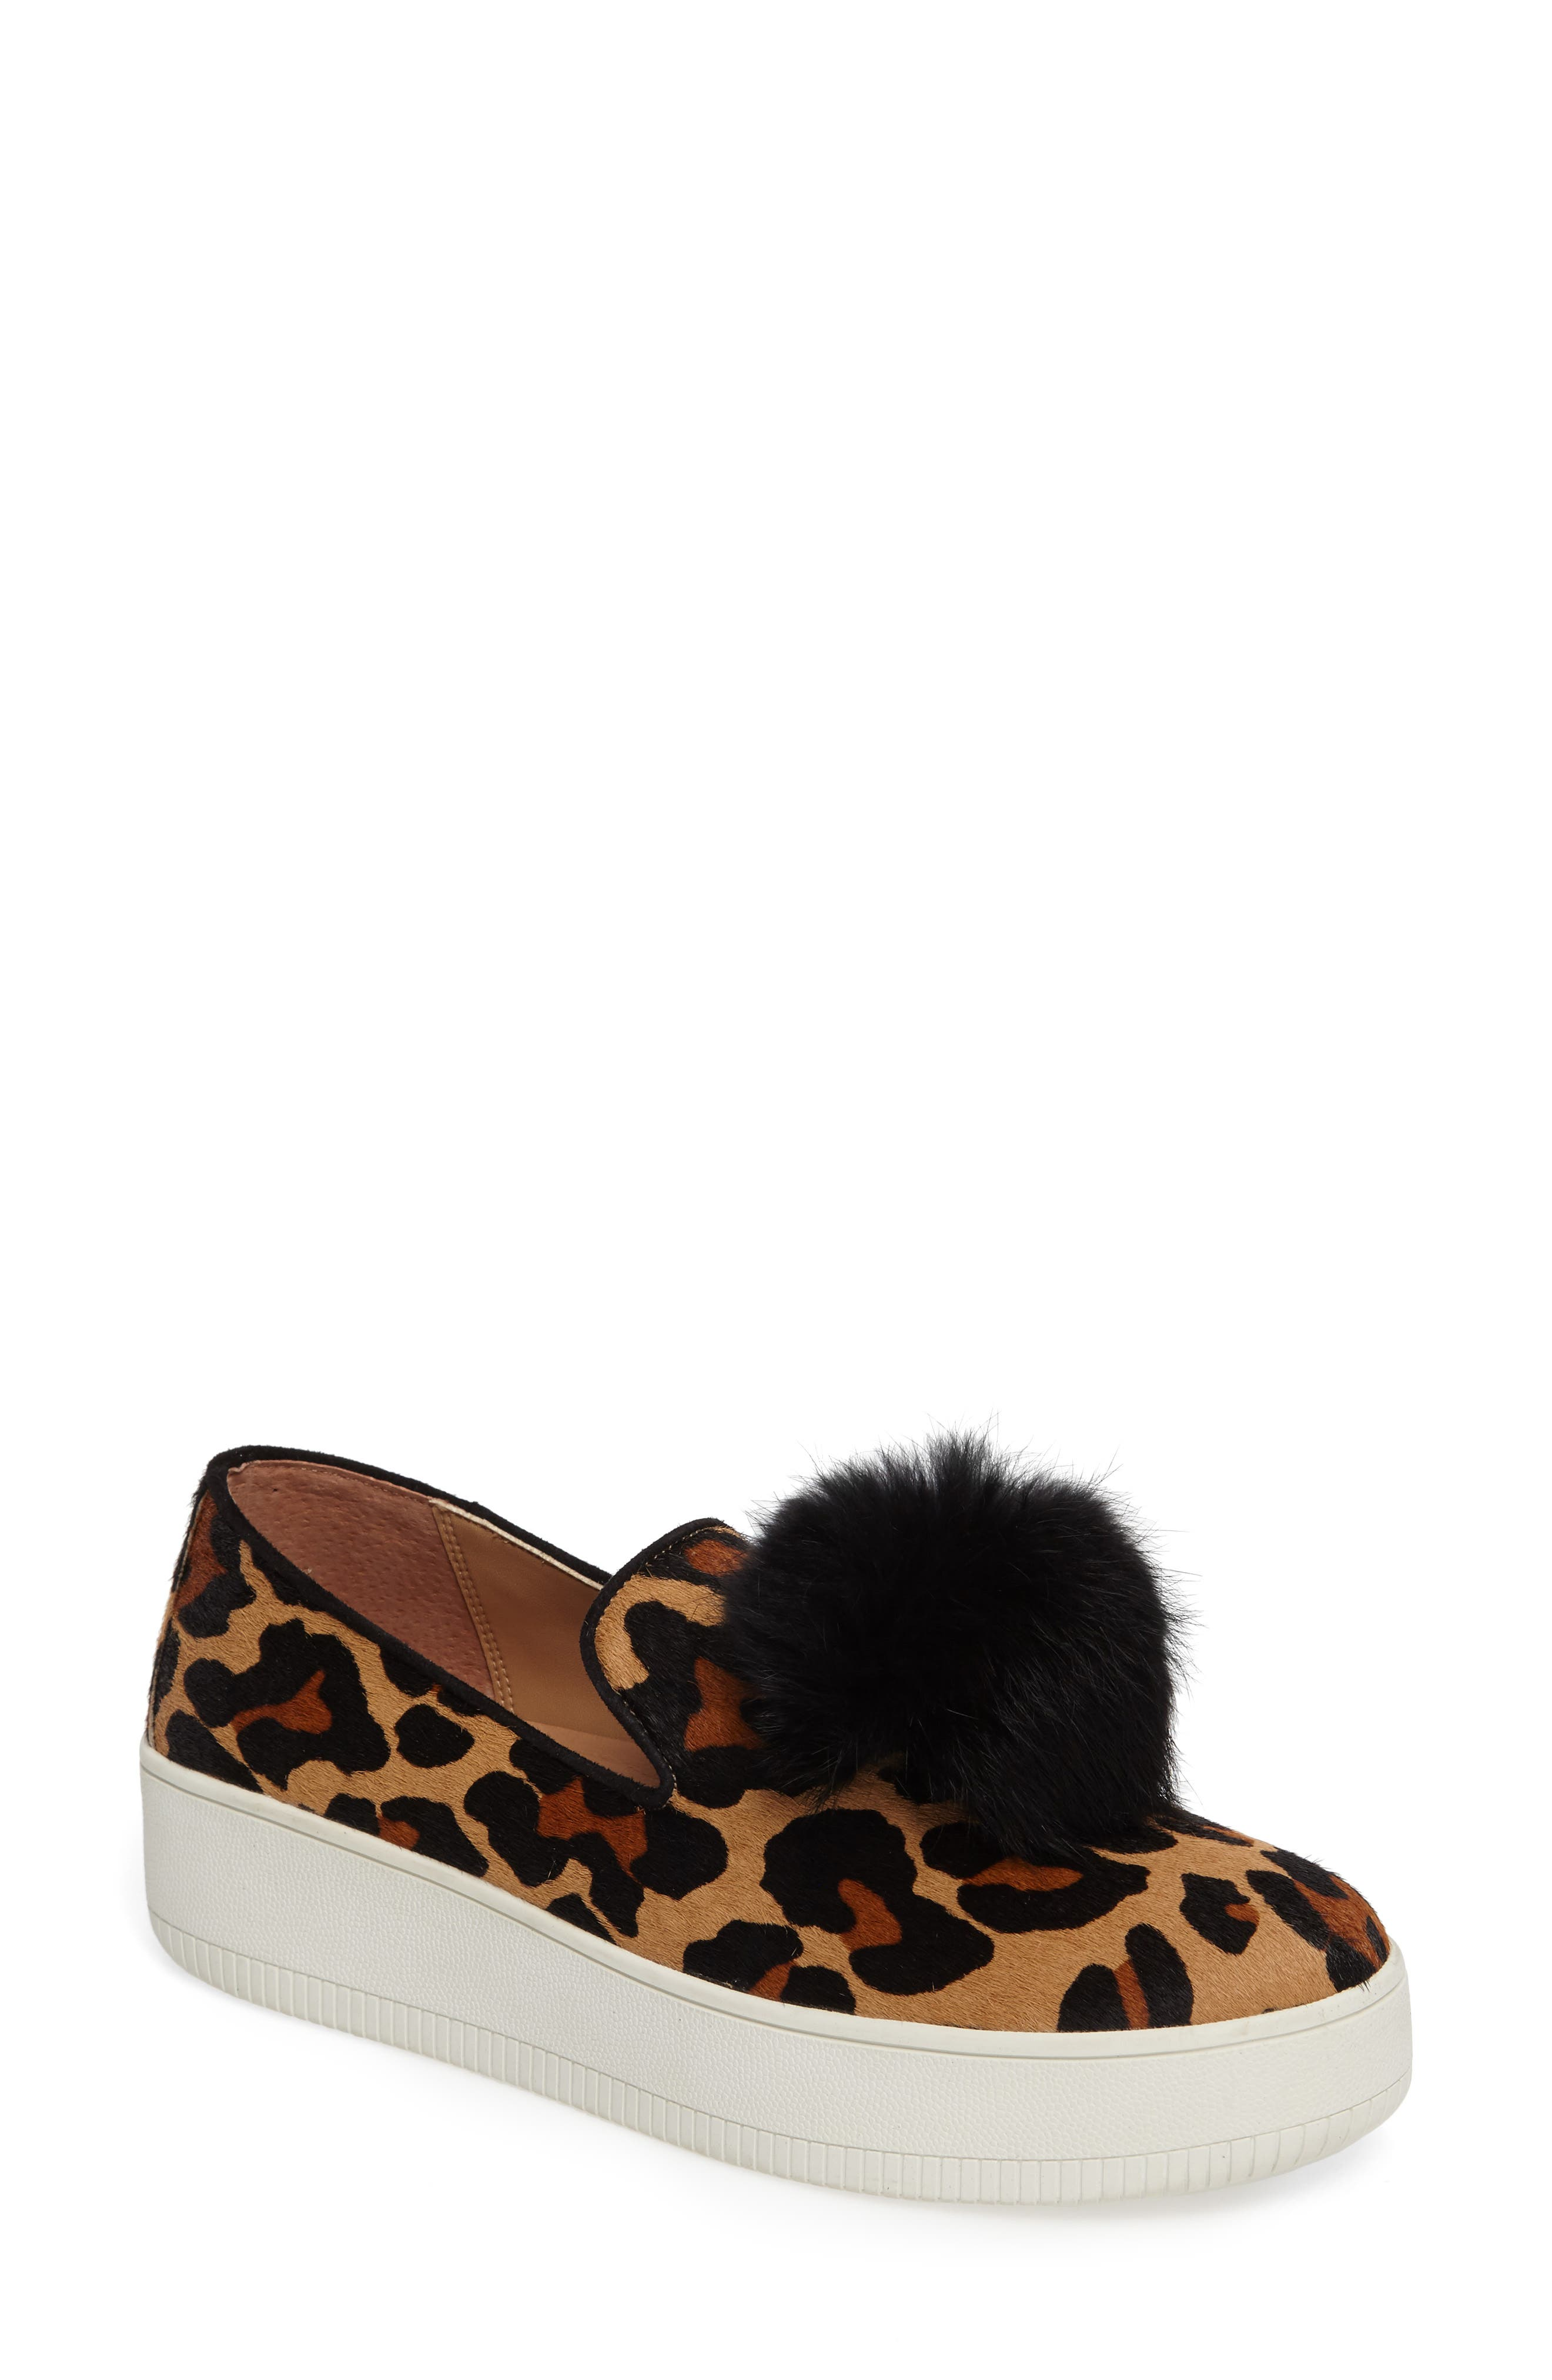 Sammy II Genuine Calf Hair Platform Sneaker with Genuine Rabbit Fur Trim,                             Main thumbnail 1, color,                             215